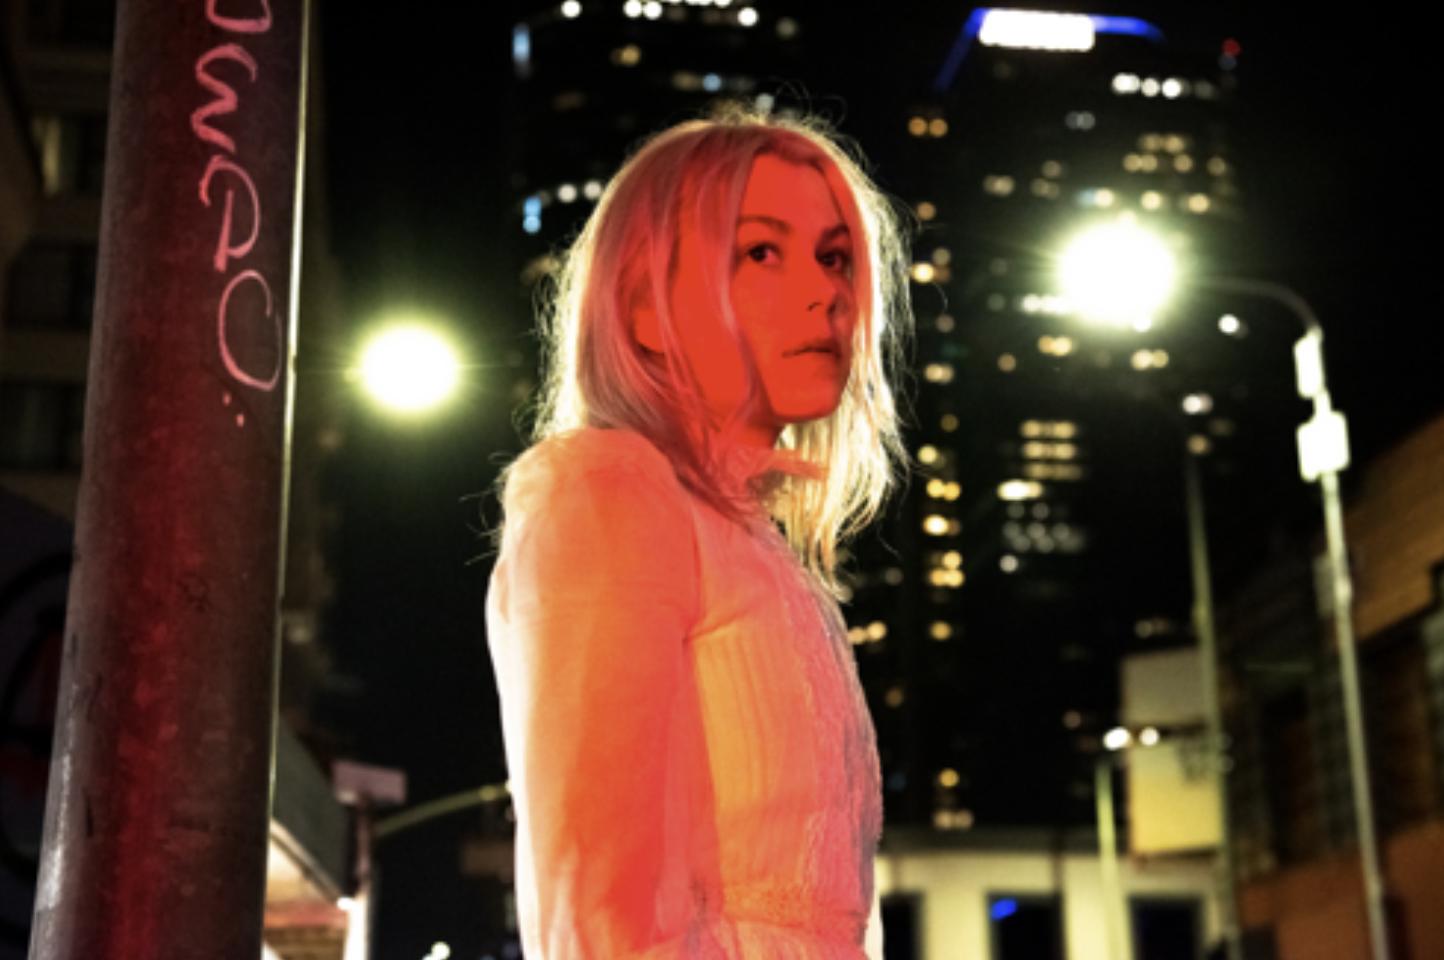 Phoebe Bridgers anuncia novo álbum e libera novo single acompanhado de videoclipe